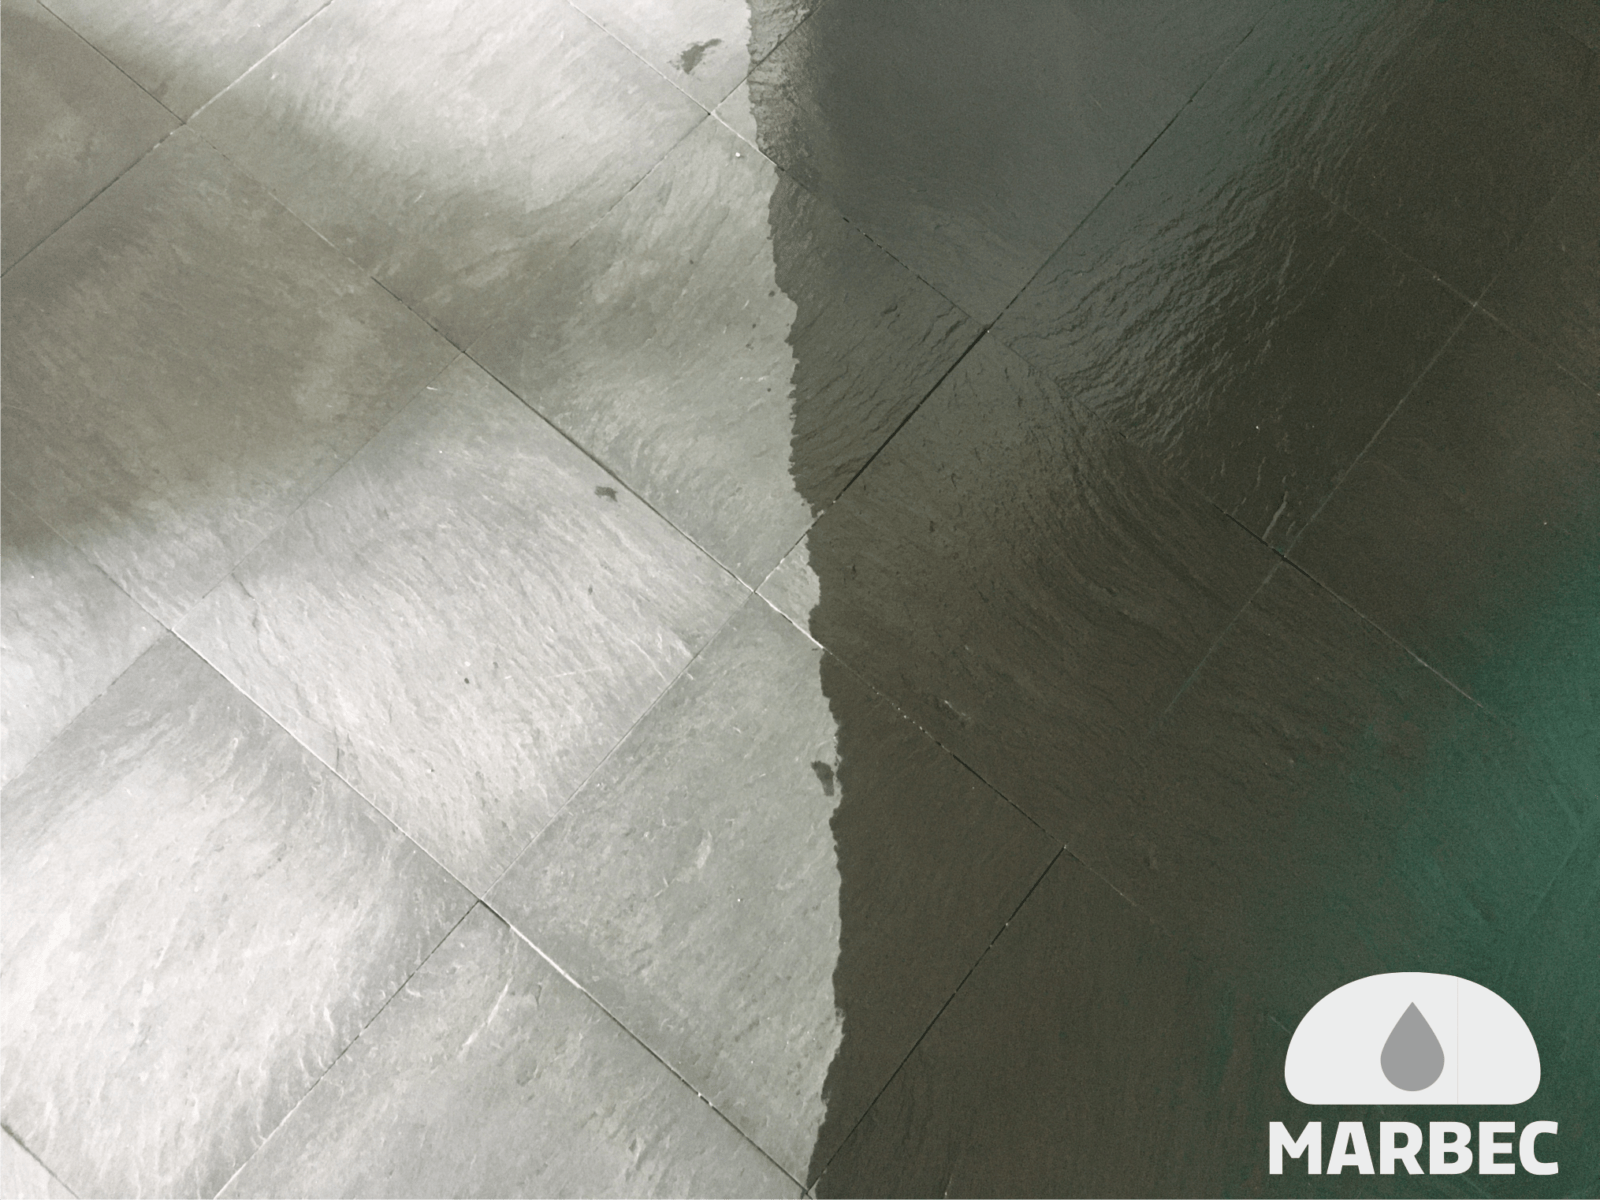 Marbec | sol rdesia avant et après traitement